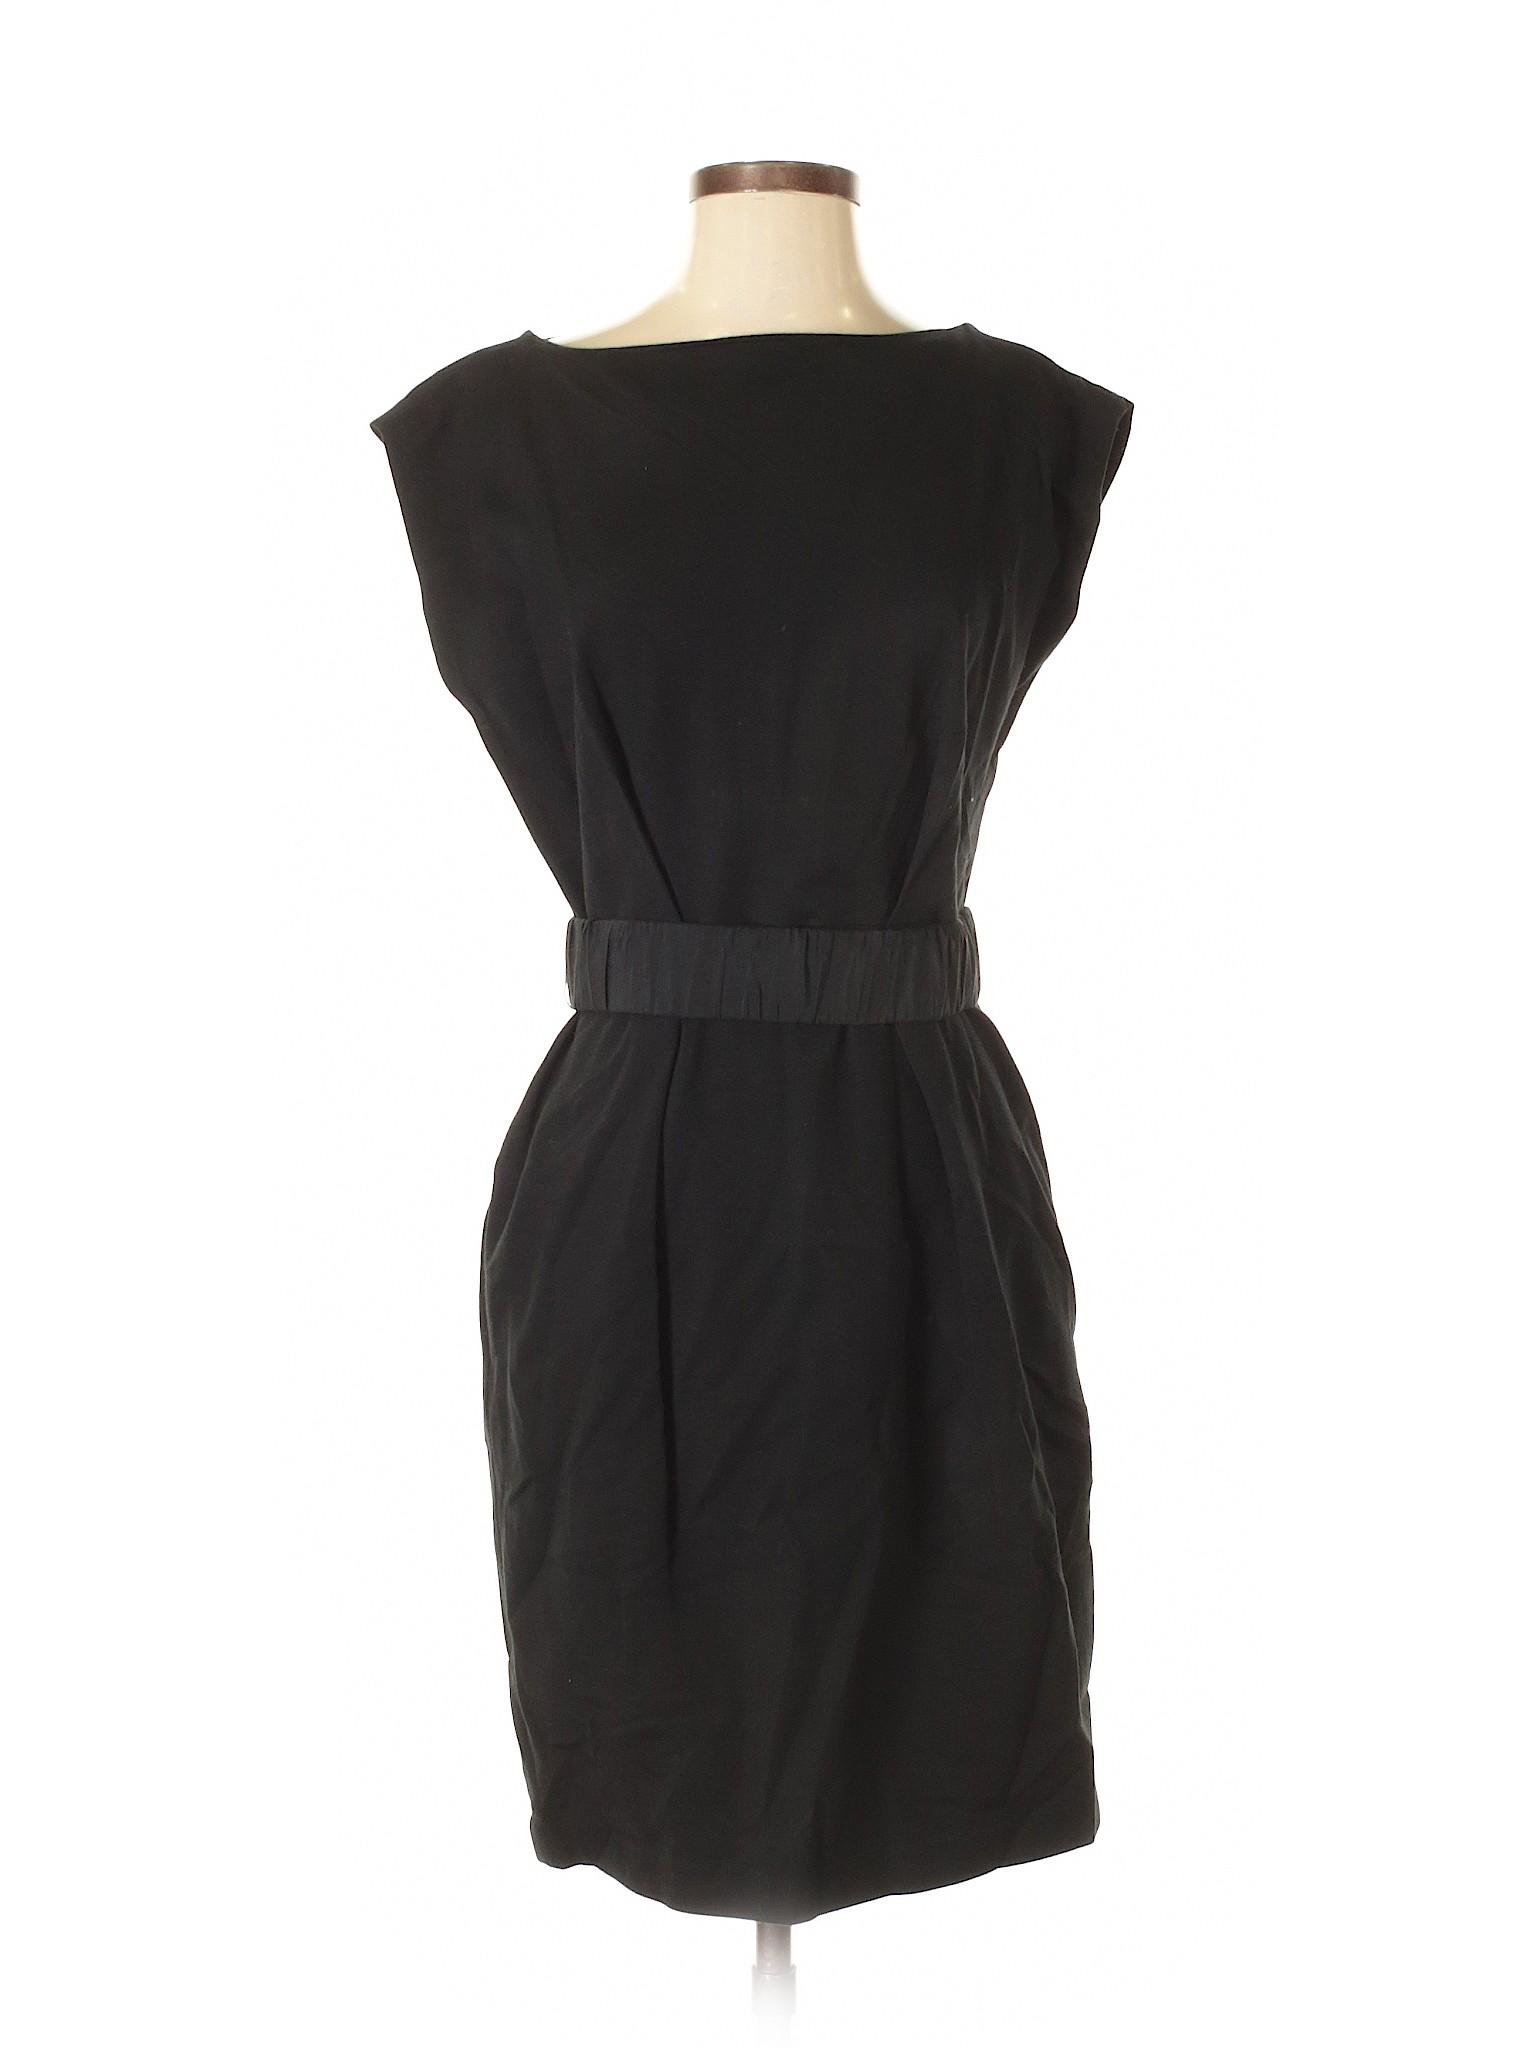 Taylor winter Casual Boutique Ann Dress LOFT Rp0n7qw